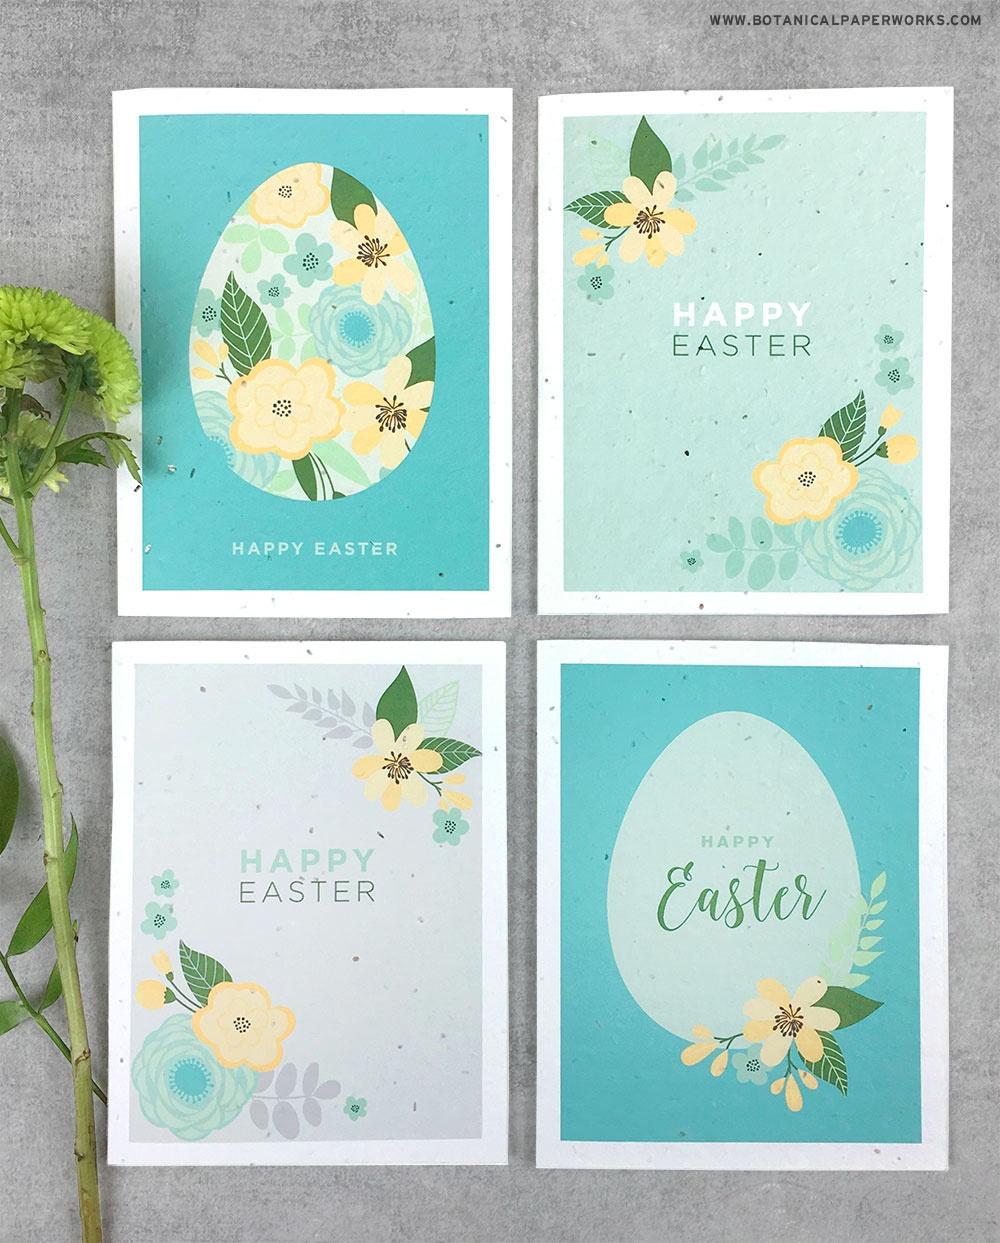 Free Printable} Easter Cards | Blog | Botanical Paperworks - Free Printable Easter Cards